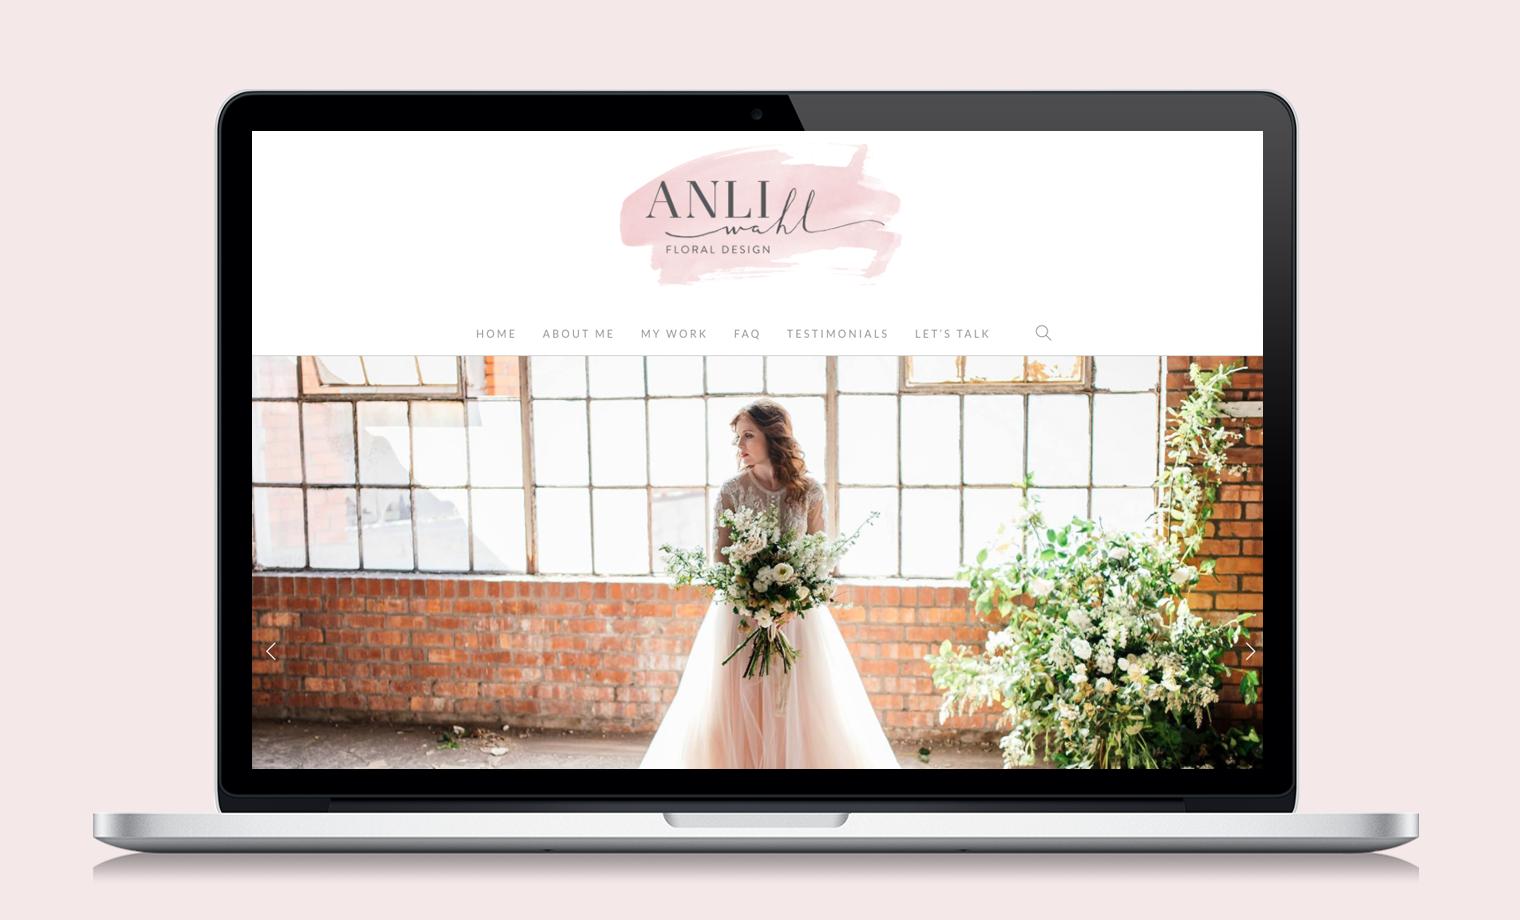 ANLI WAHL WEBSITE